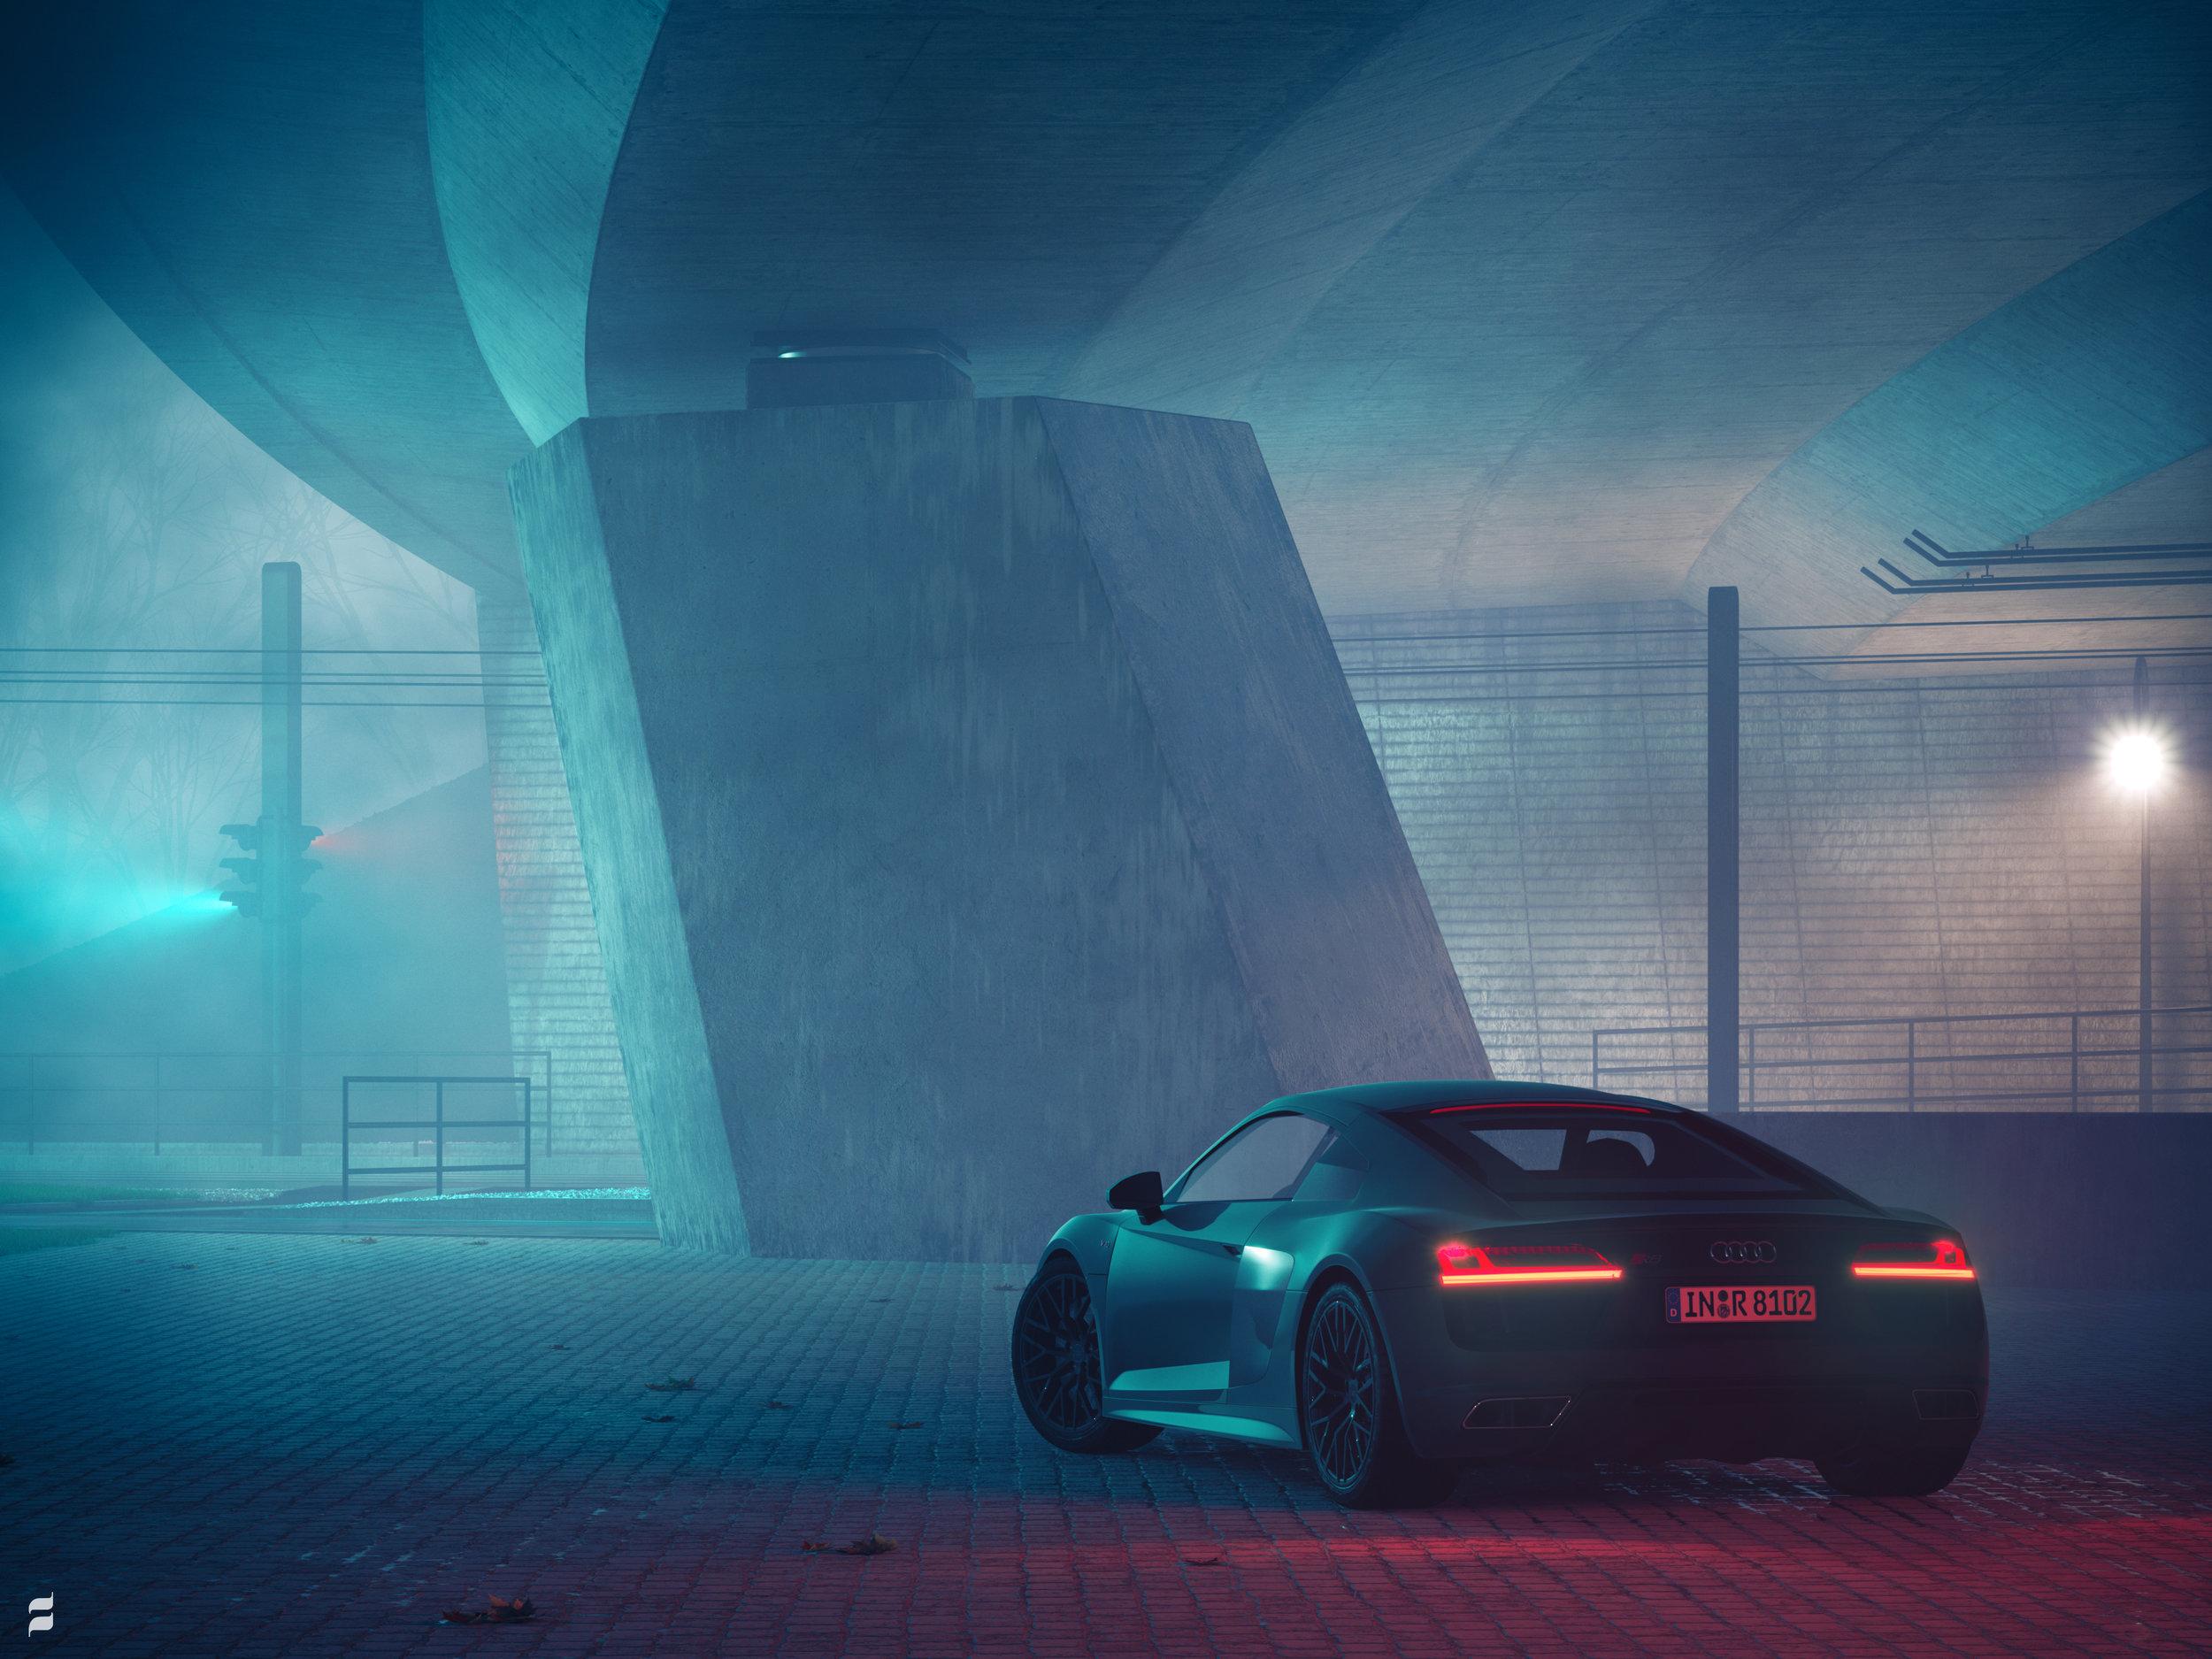 Audi_R8_H_01-bluish.jpg